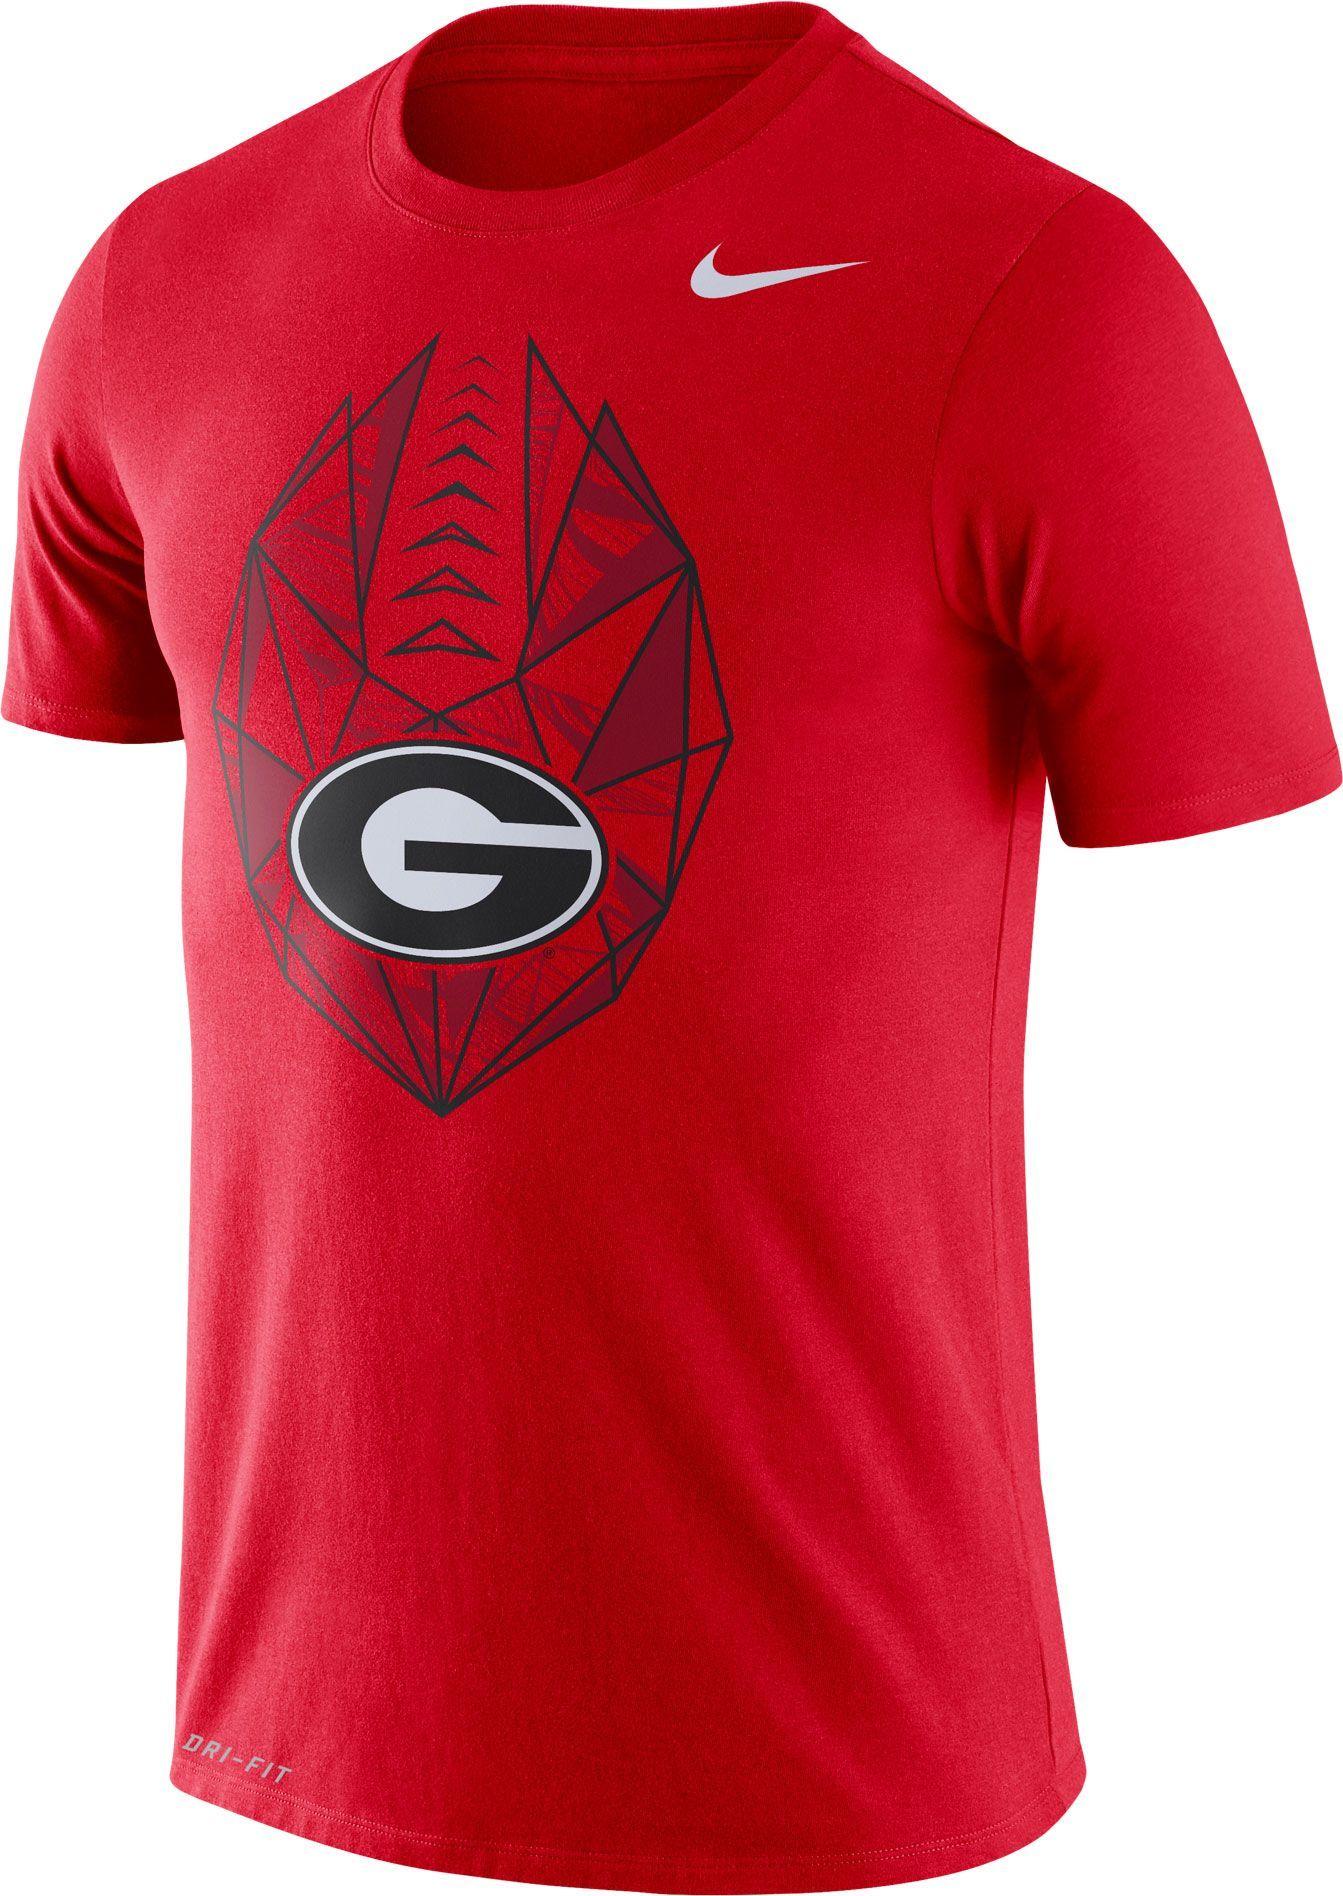 Nike Mens Georgia Bulldogs Red Dri Fit Football Icon T Shirt